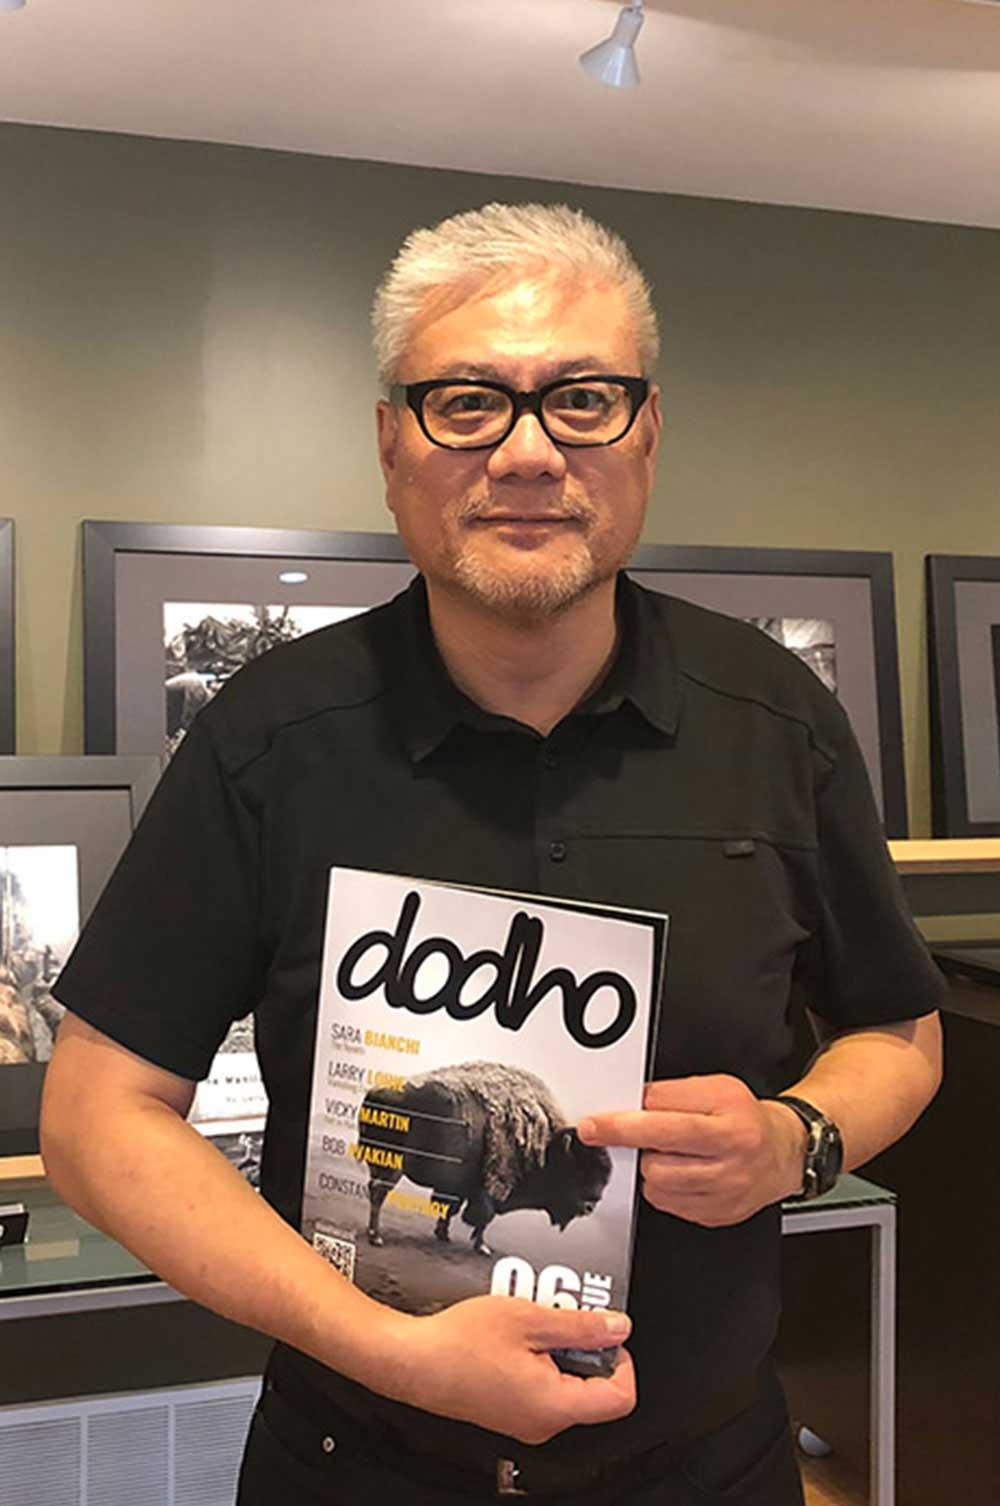 https://www.dodho.com/wp-content/uploads/2018/08/az.jpg